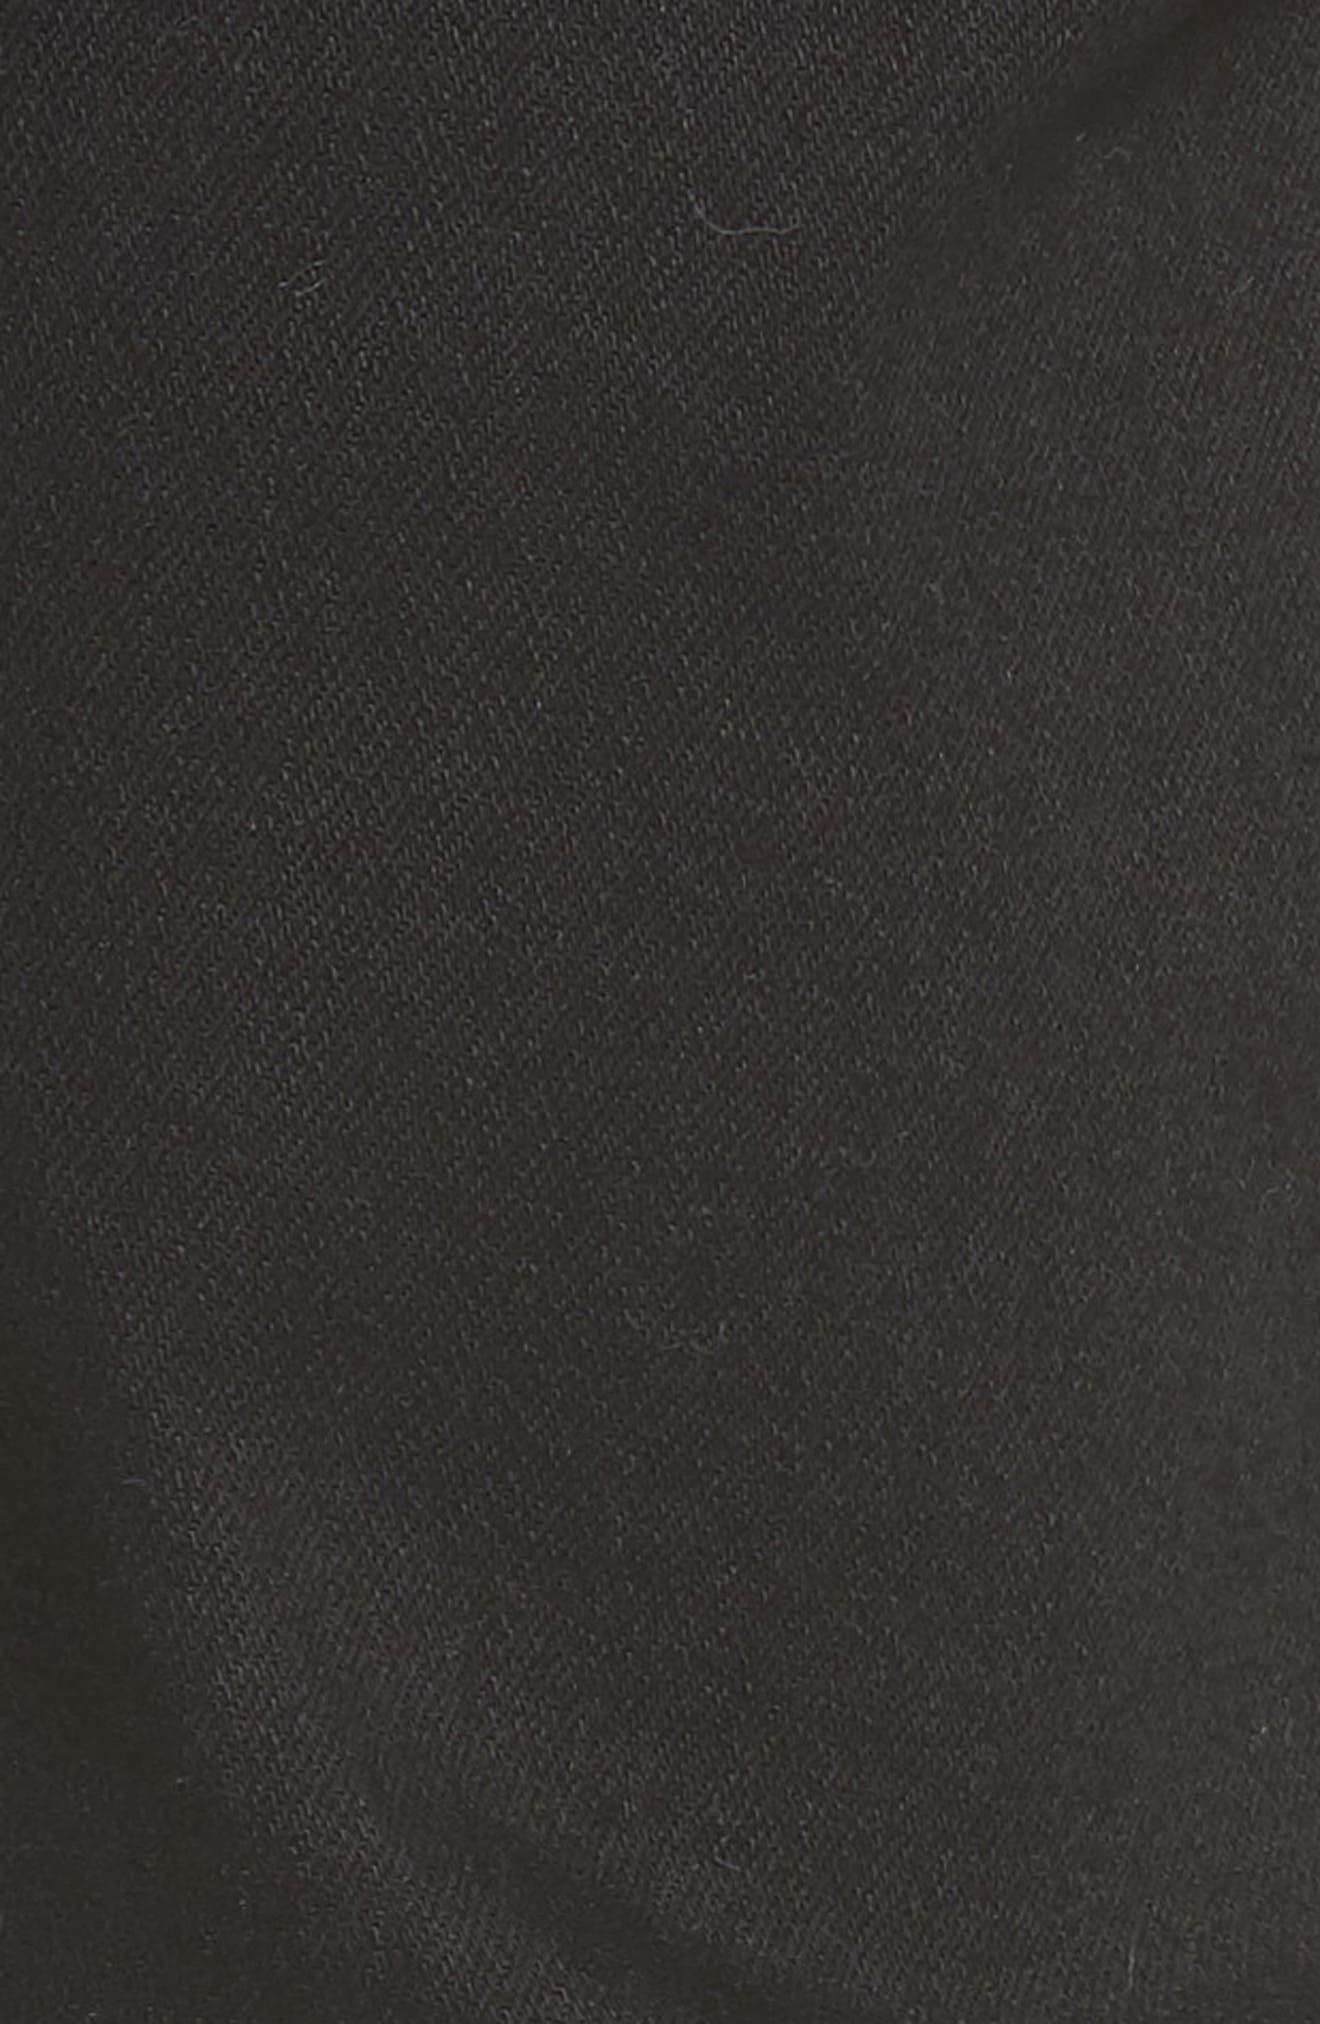 Snap Skinny Fit Jeans,                             Alternate thumbnail 5, color,                             Organic Black